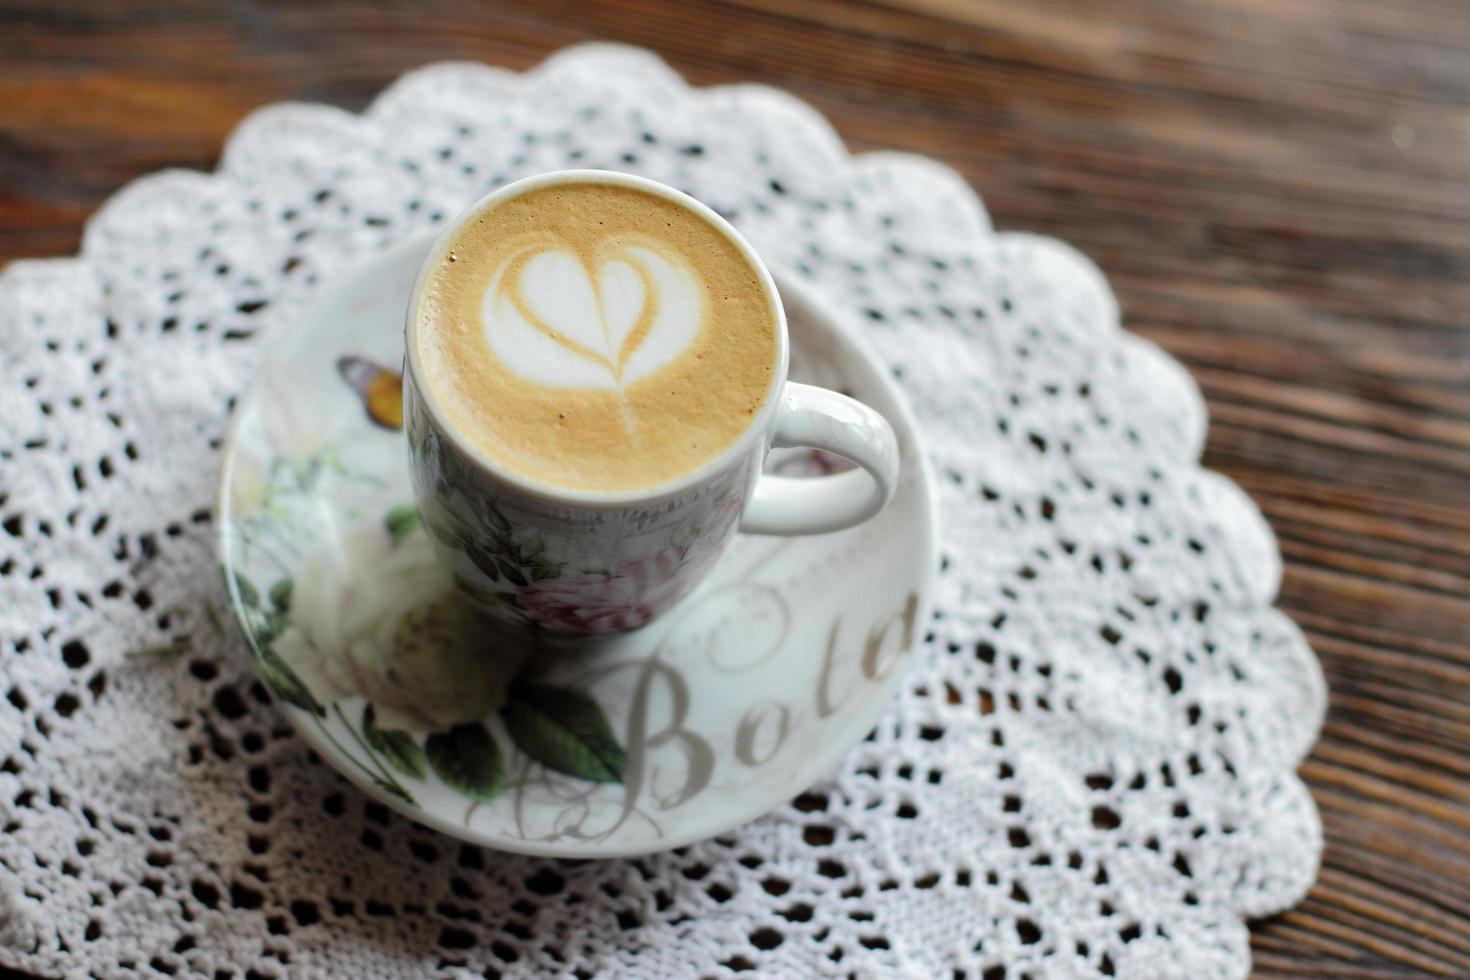 cappuccino sur une table photo